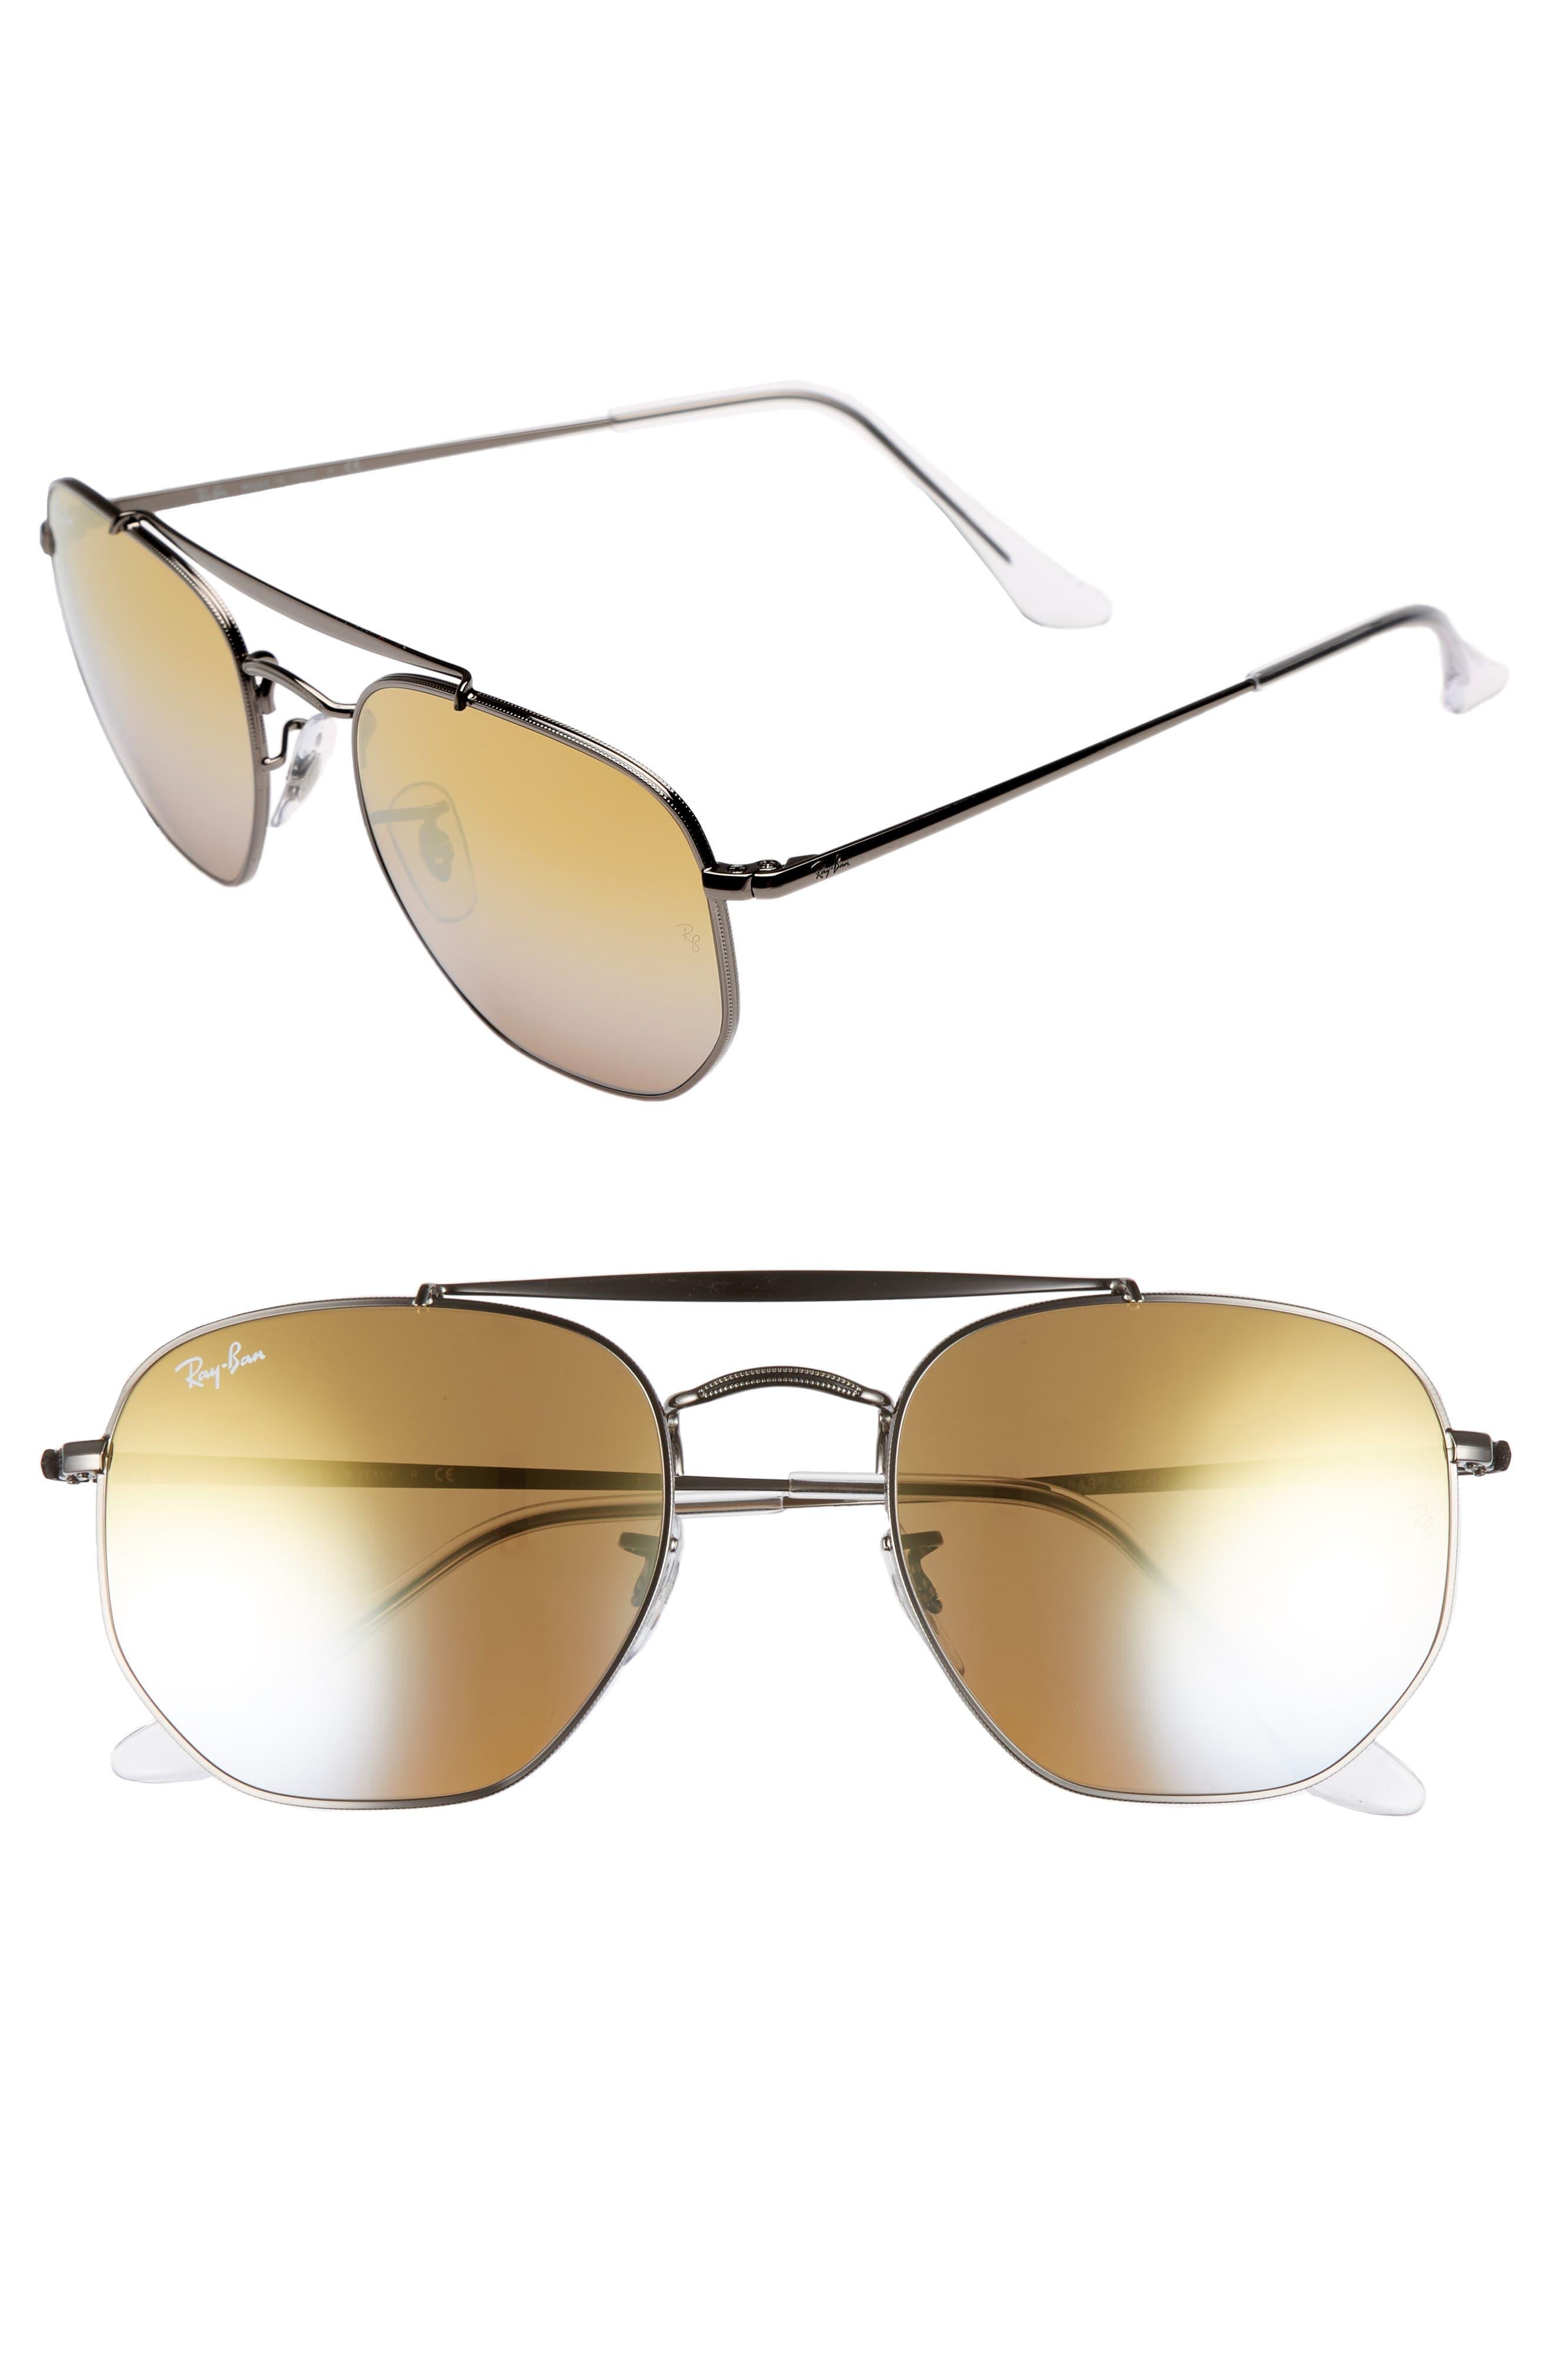 Ray-Ban 54mm Gradient Sunglasses